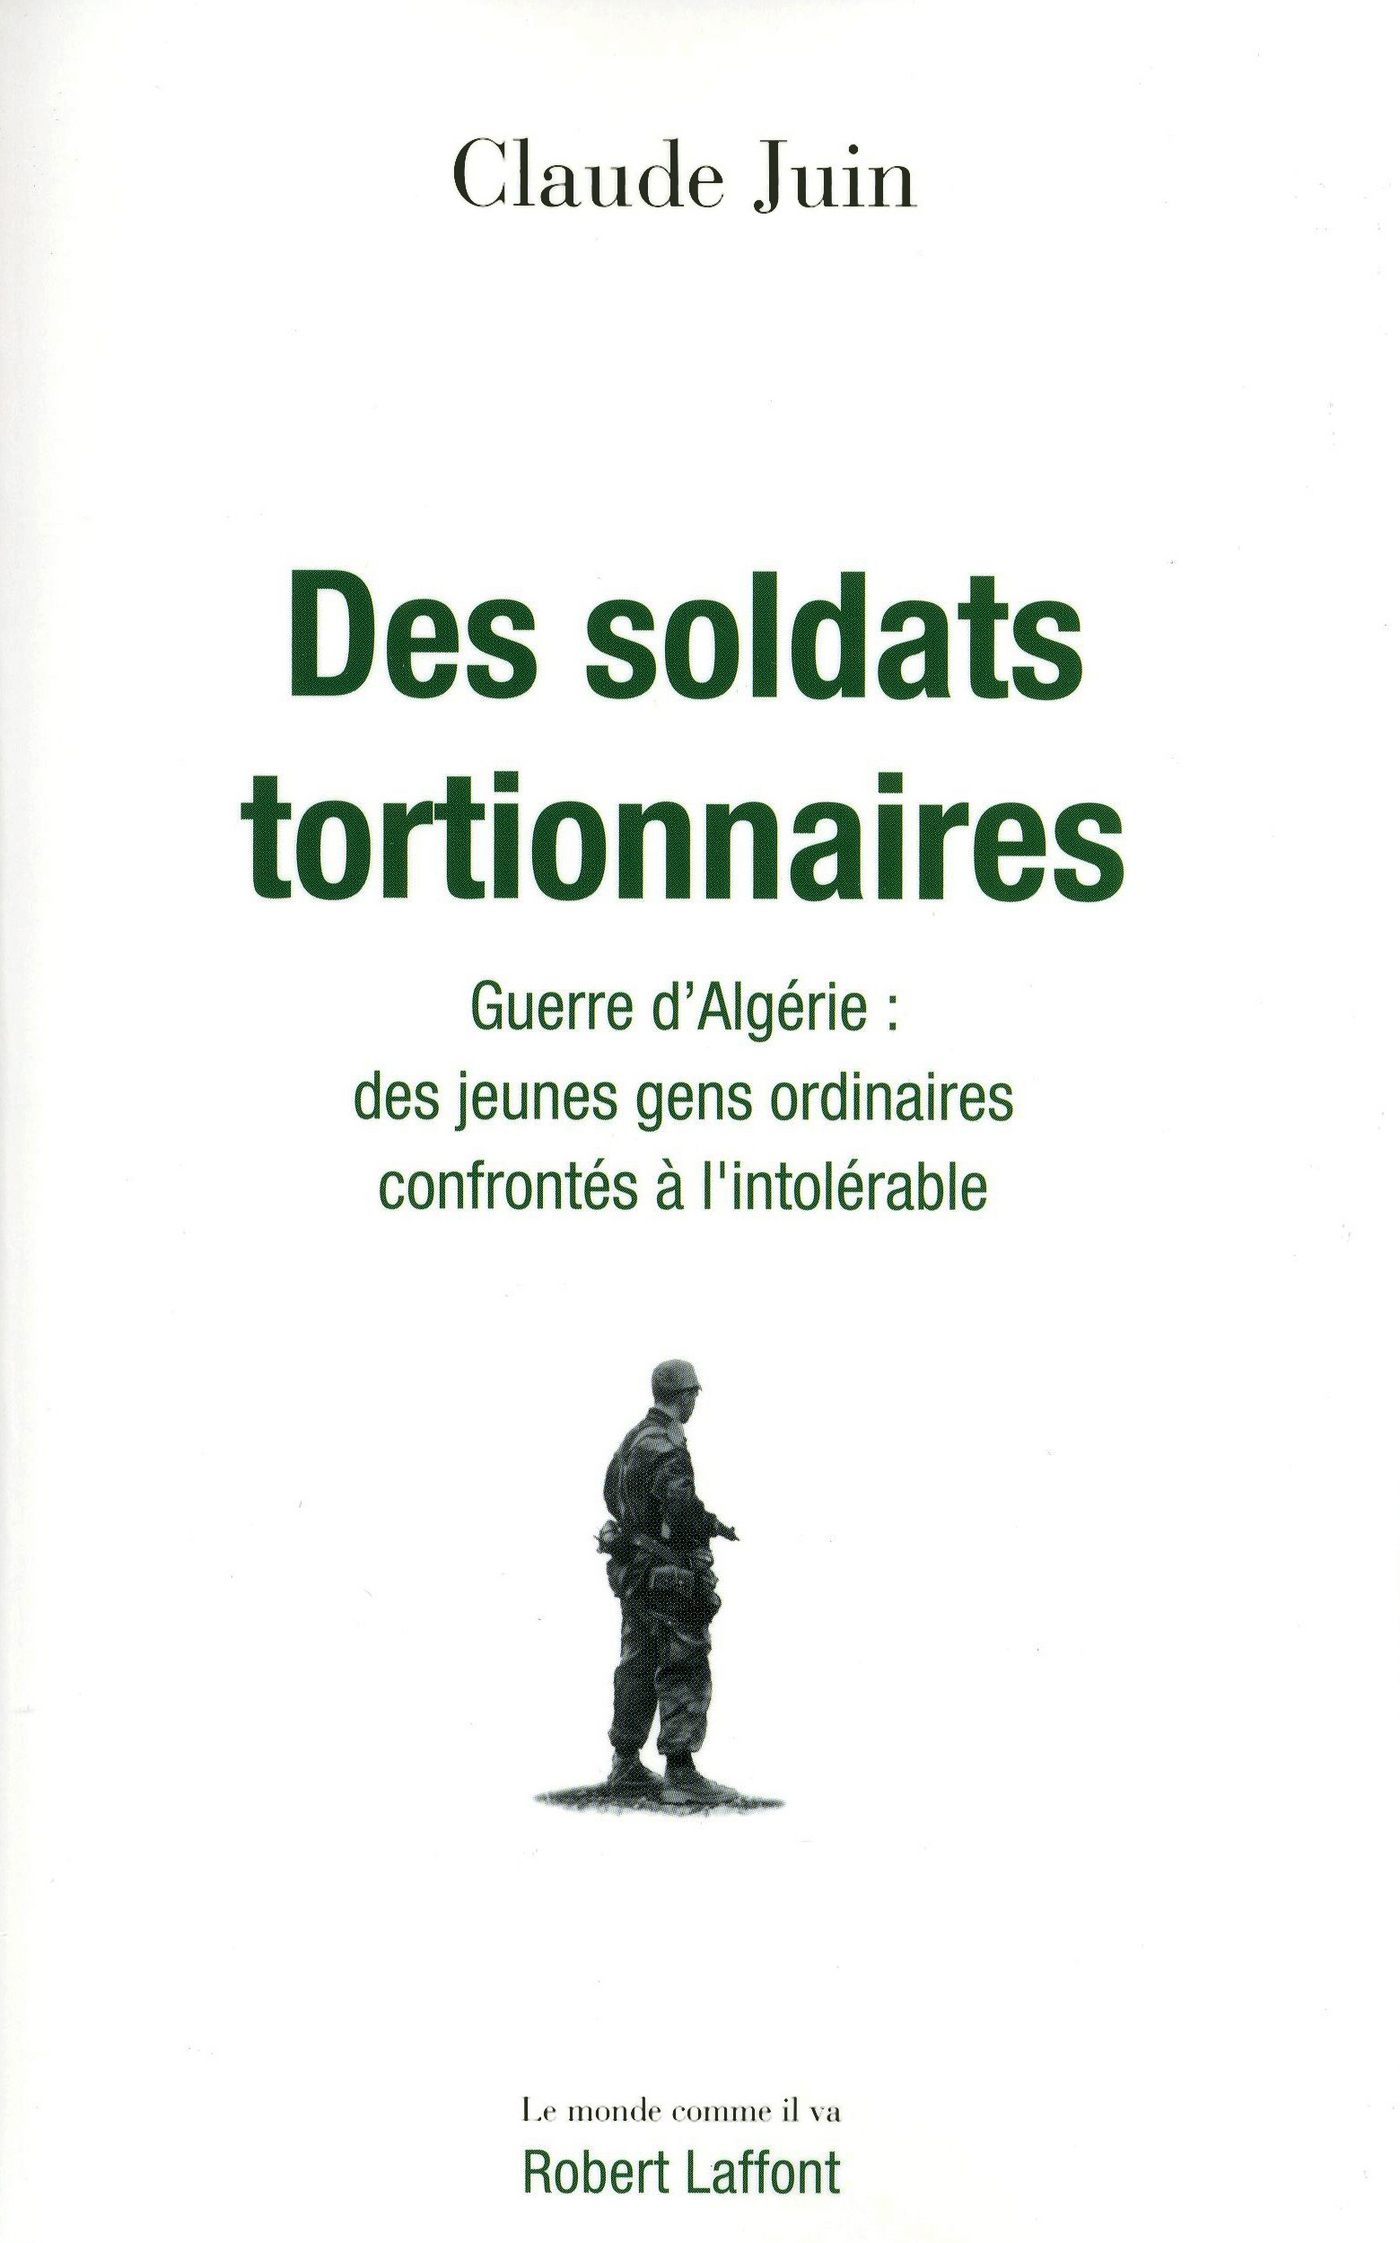 Des soldats tortionnaires